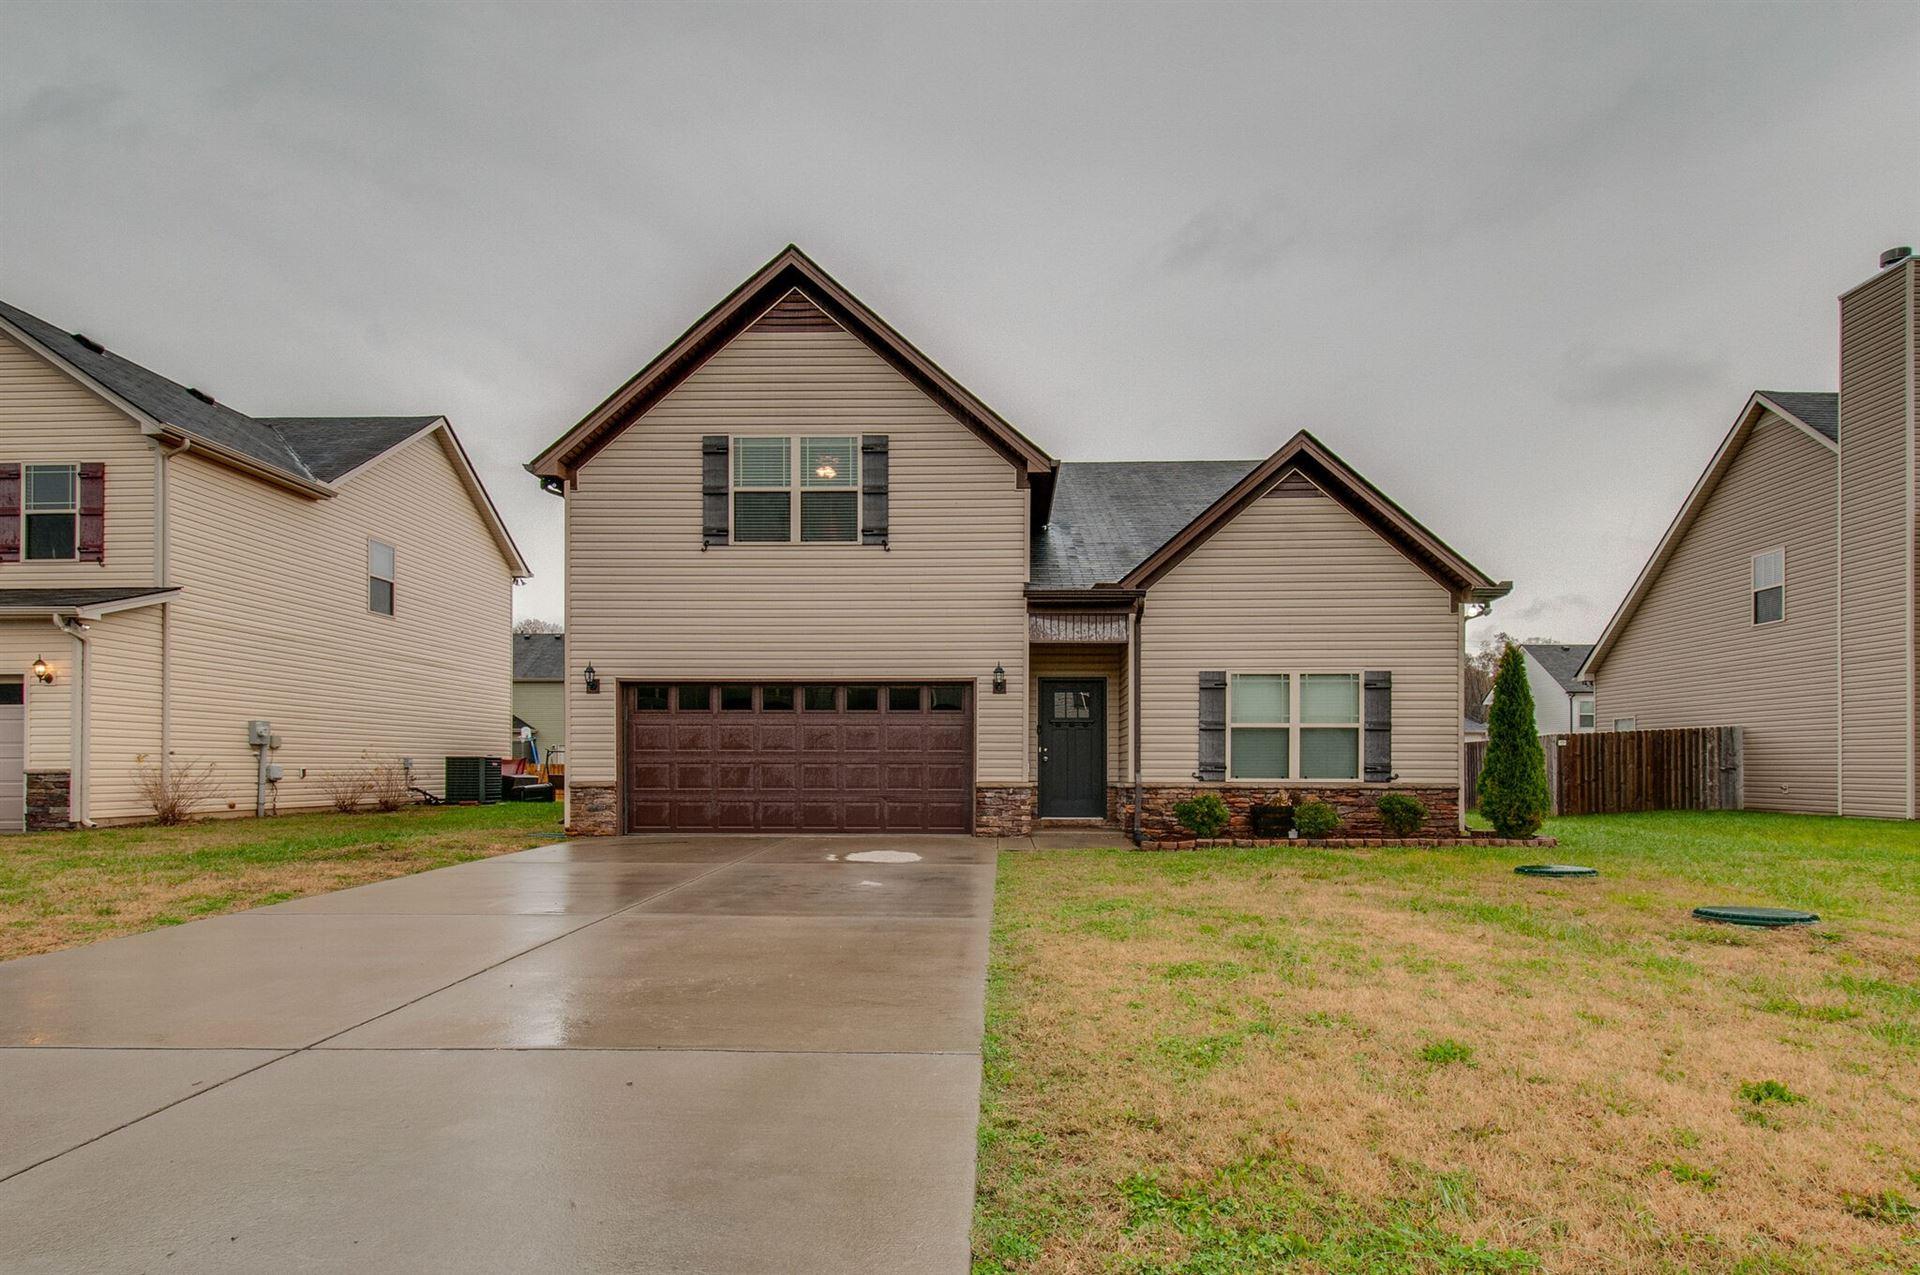 1116 Selous Drive, Murfreesboro, TN 37128 - MLS#: 2210673